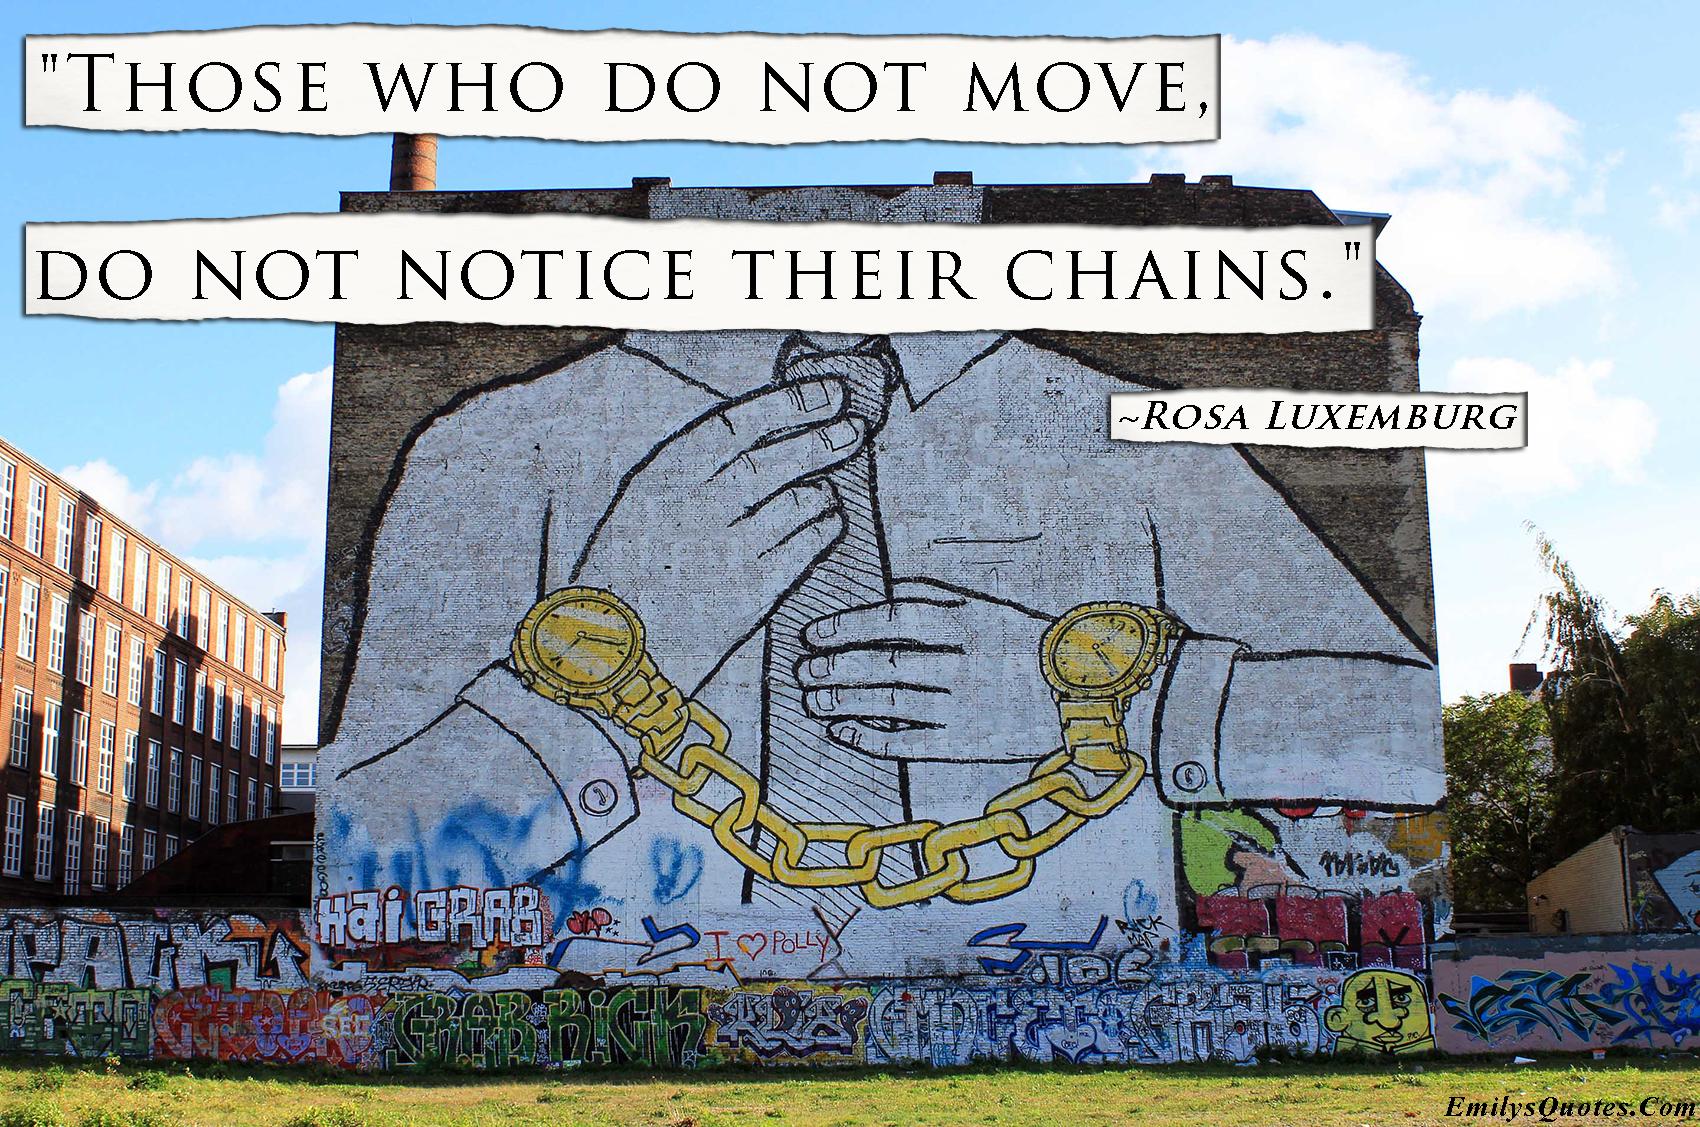 EmilysQuotes.Com - notice, chains, Rosa Luxemburg, experience, ignorance